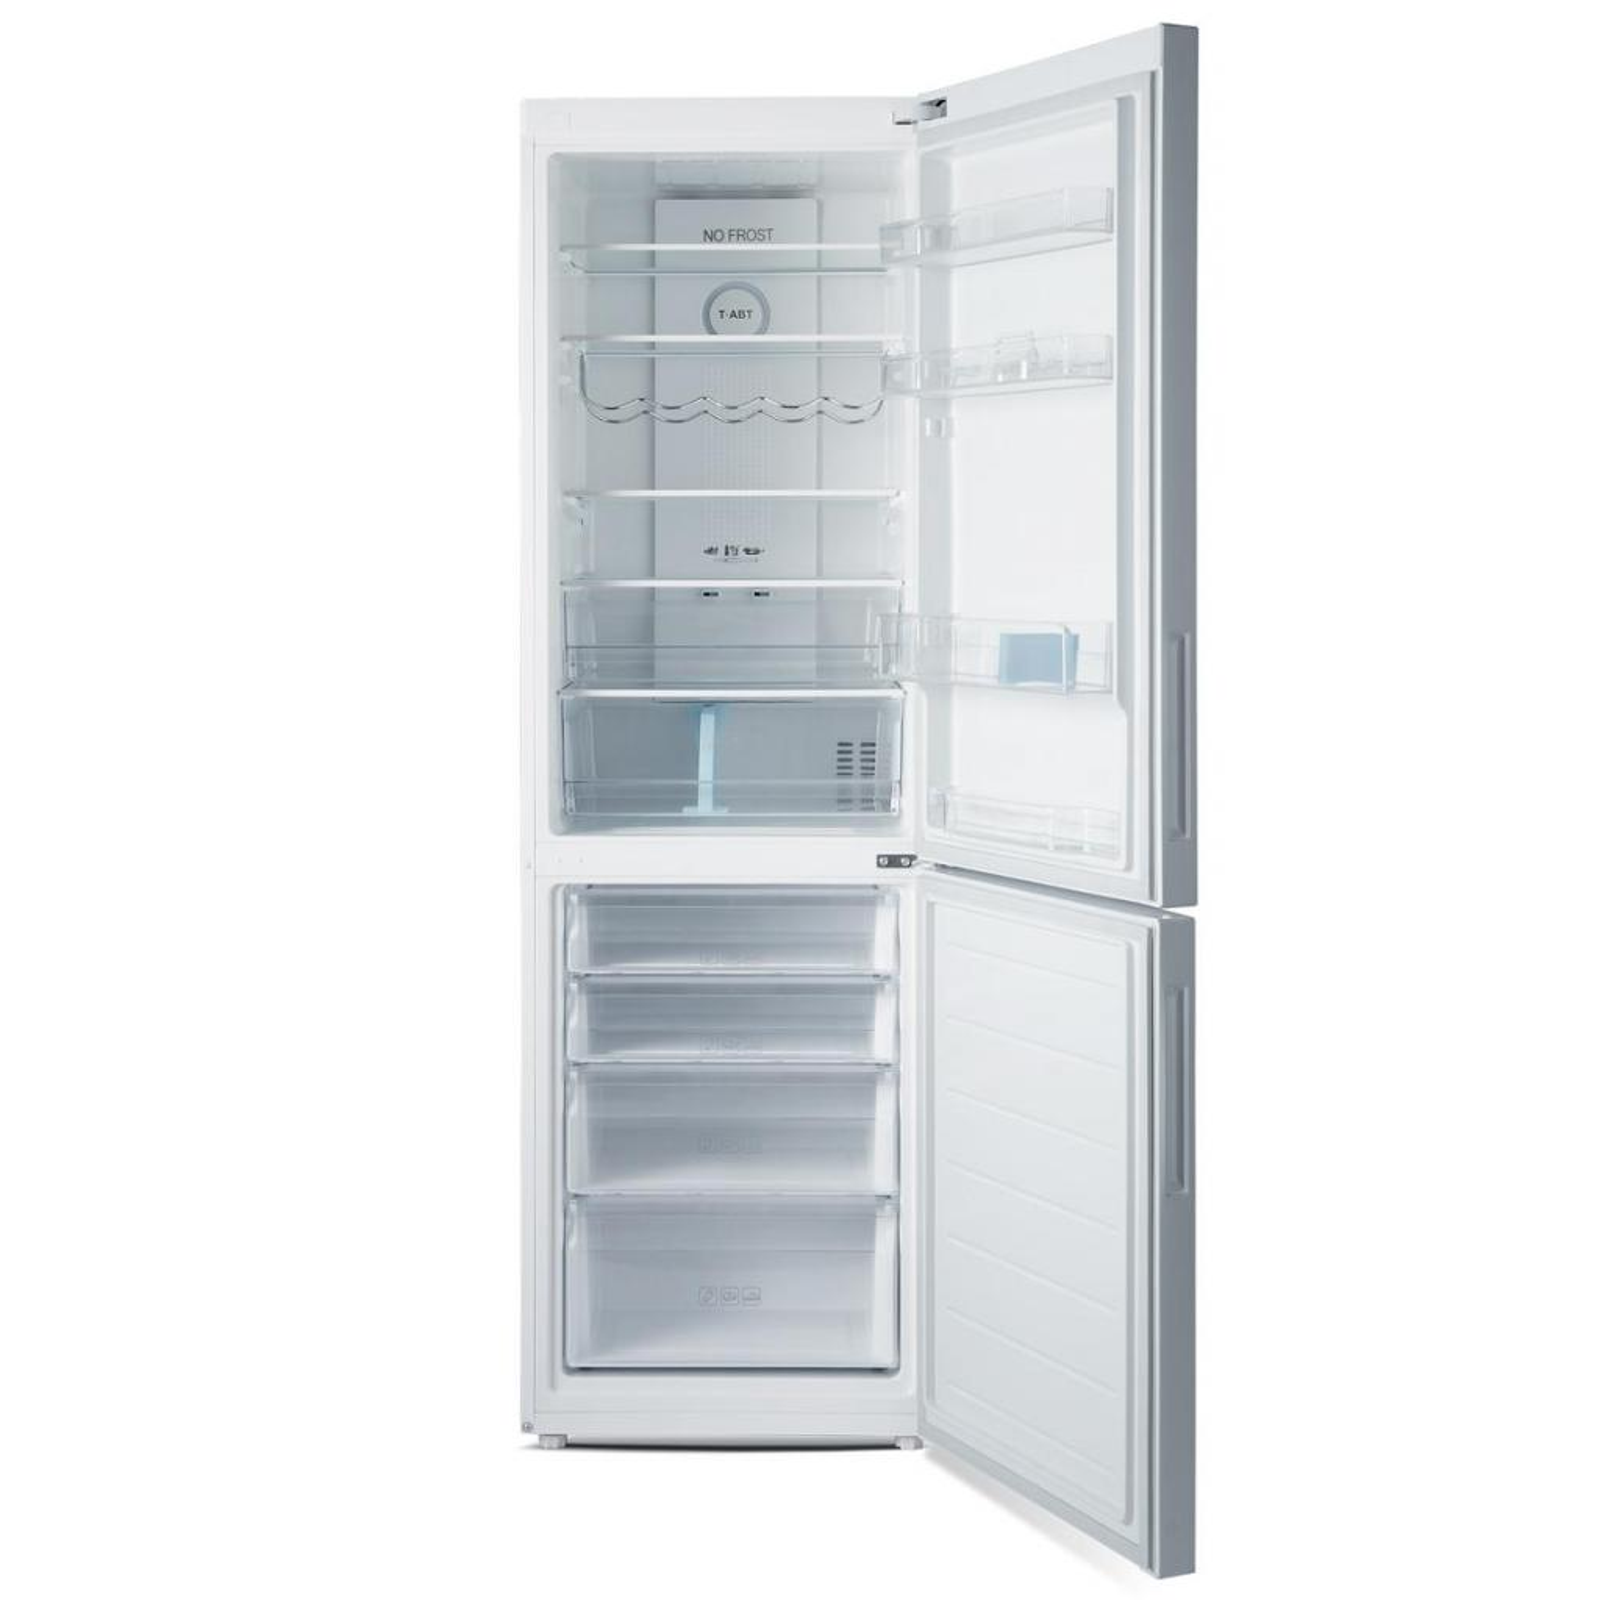 Холодильник Haier HA C2F636CWRG изображение 3